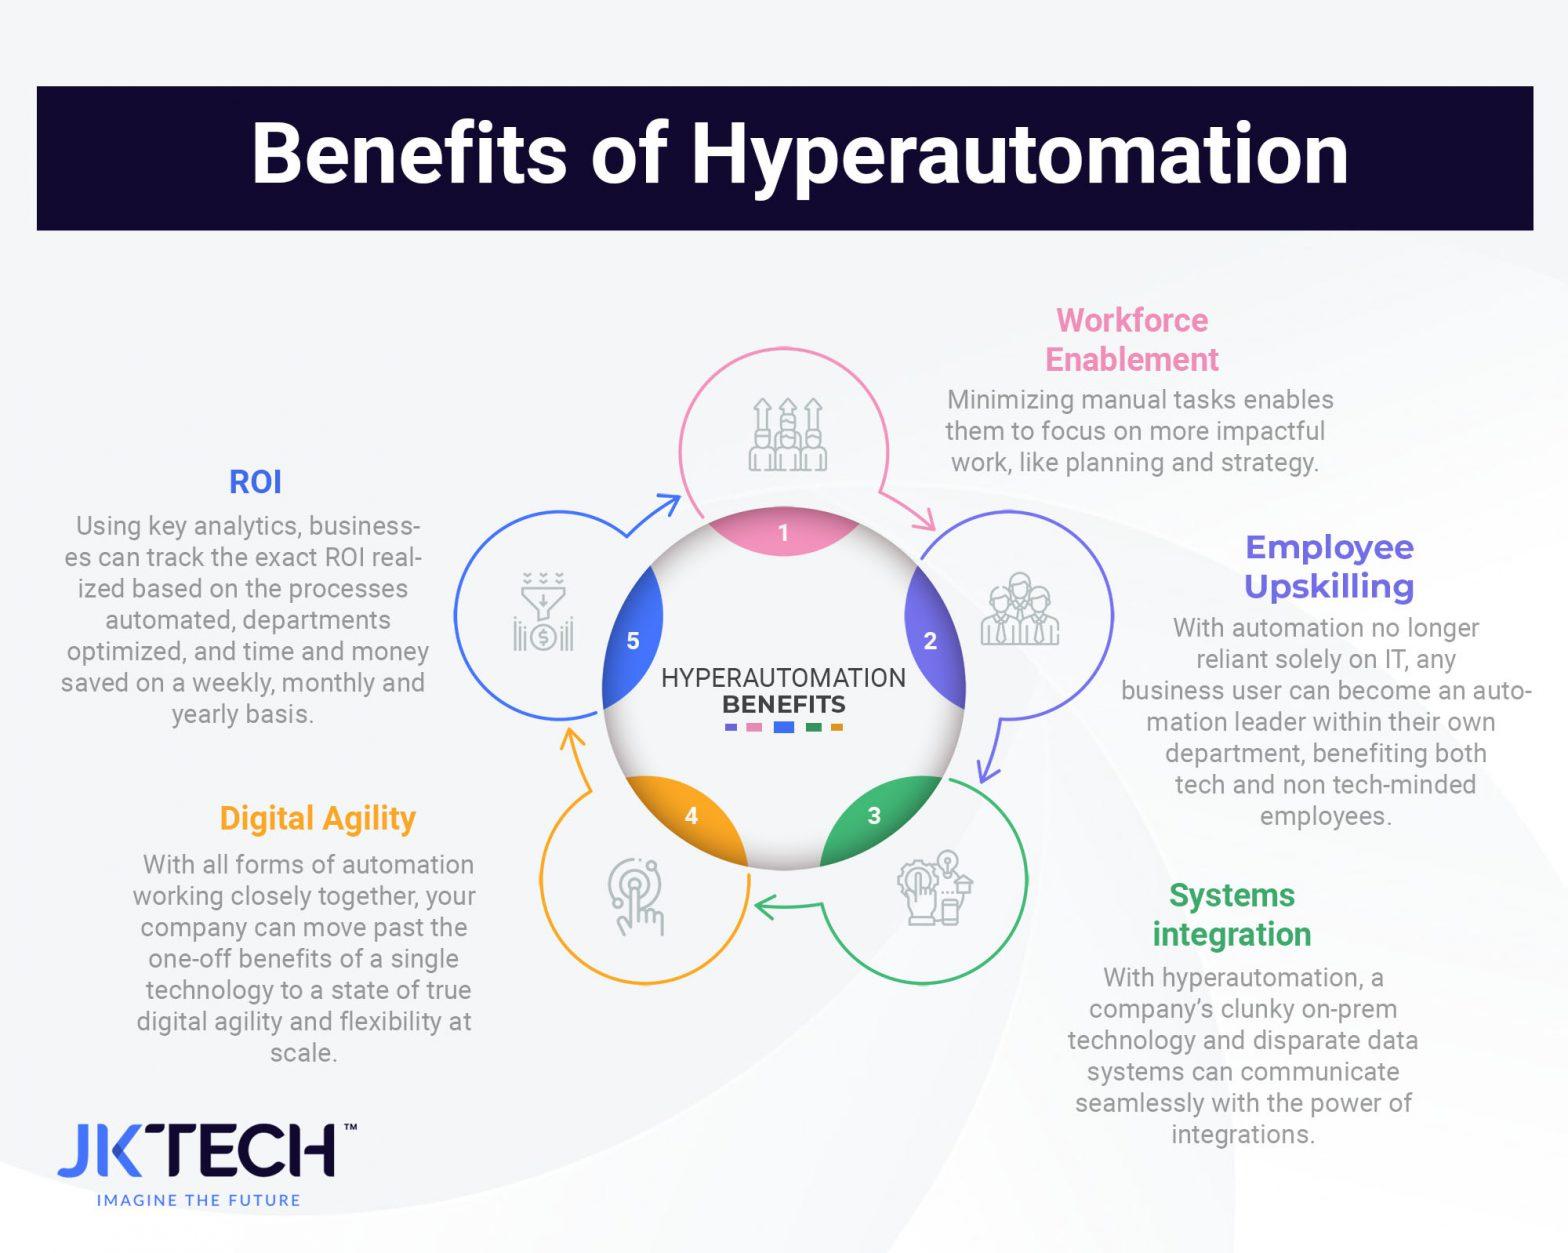 Benefits of Hyperautomation